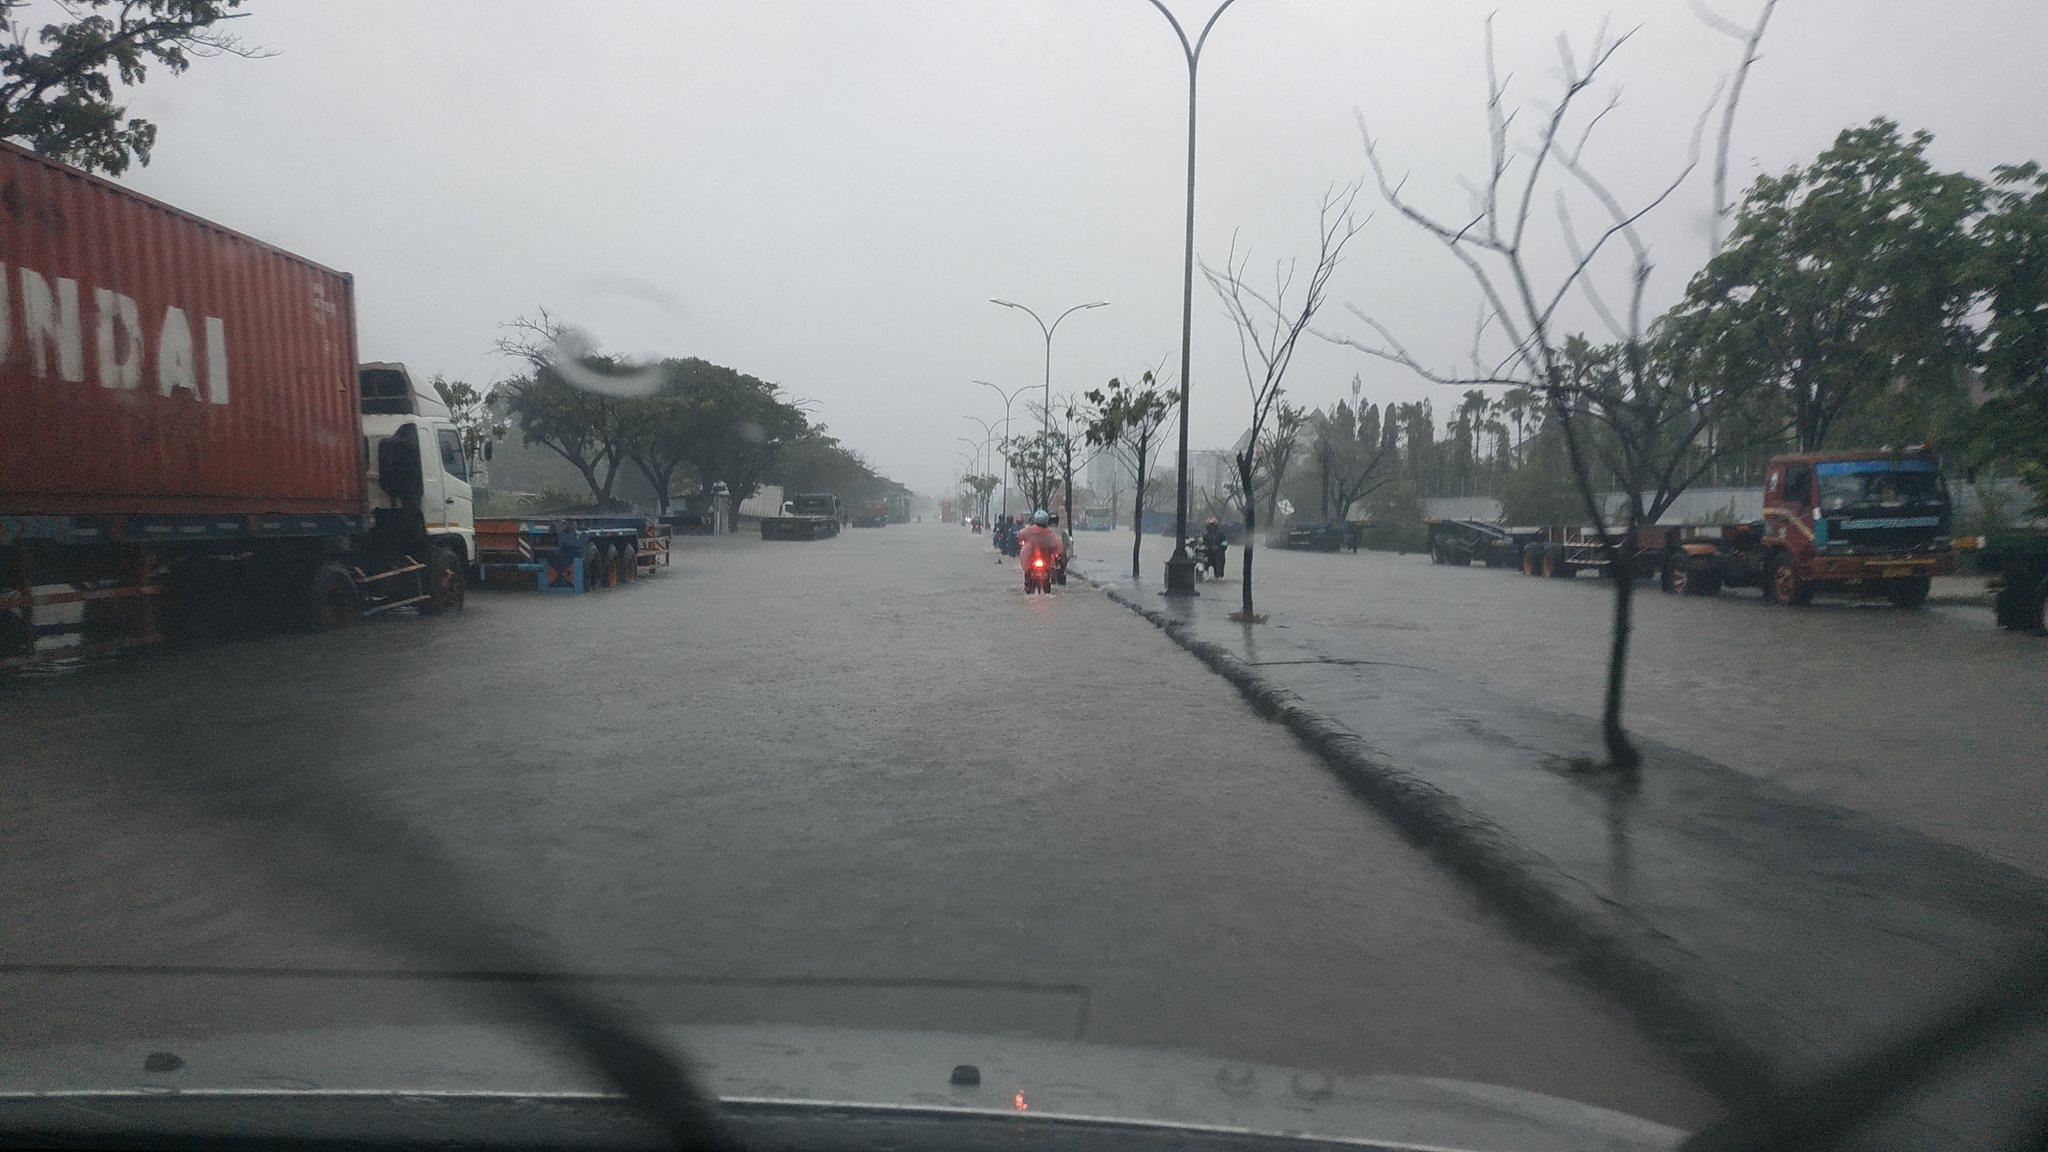 Medsos Sepi, Semarang Banjir Tetap yang Disalahkan Anies Baswedan